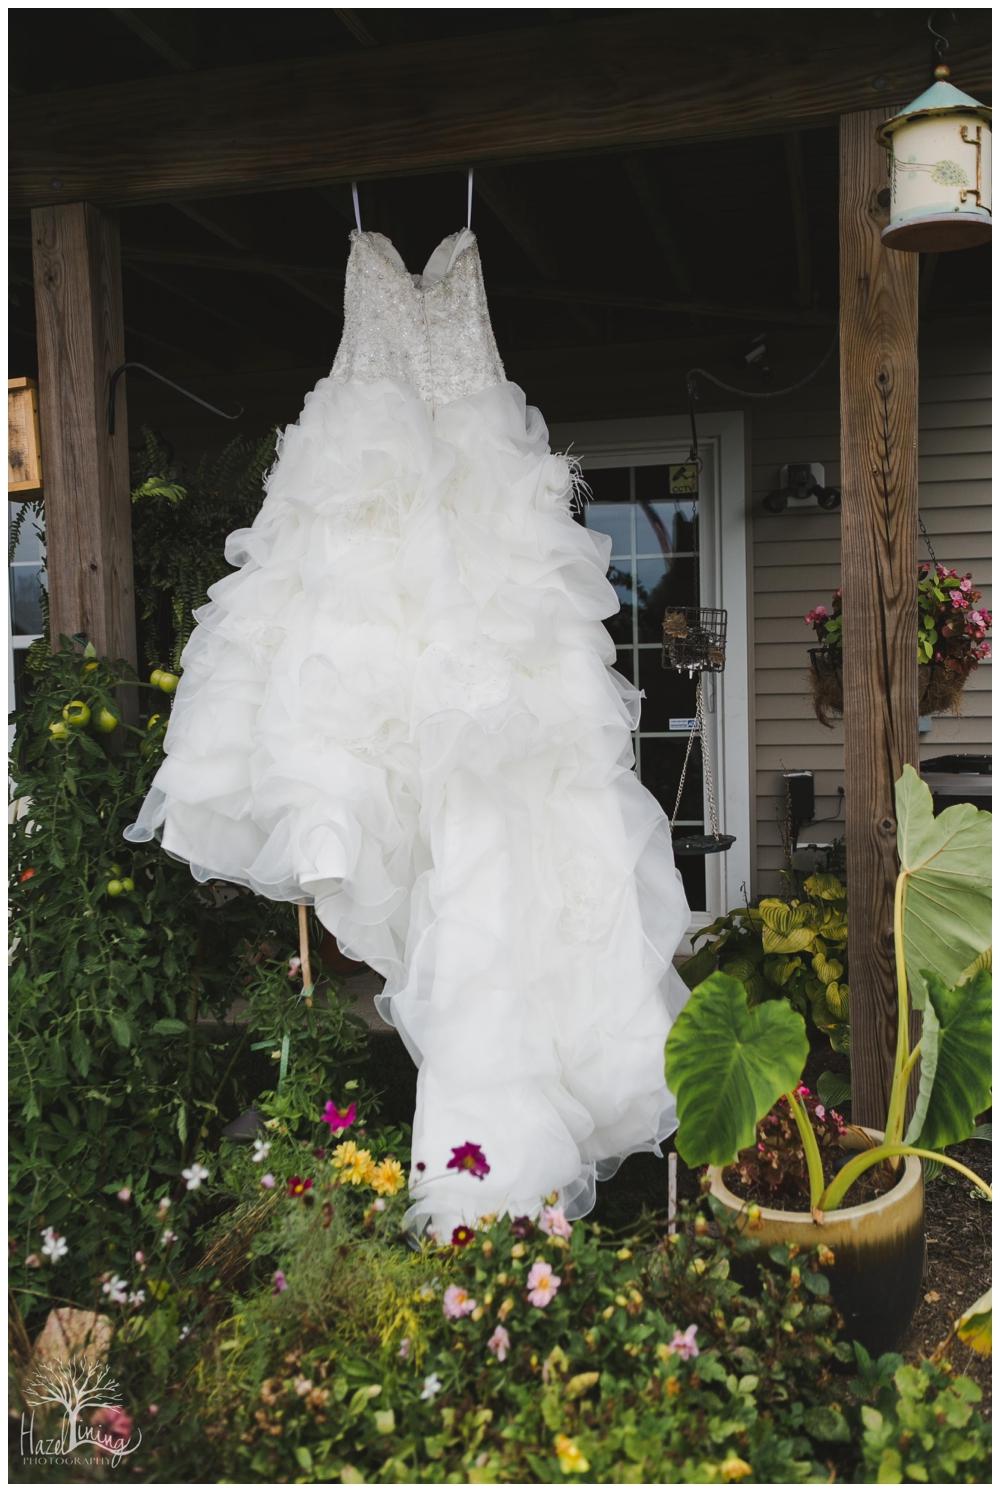 hazel-lining-photography-wedding-portrait-buckscounty-pennsylvania-stephanie-reif_0127.jpg